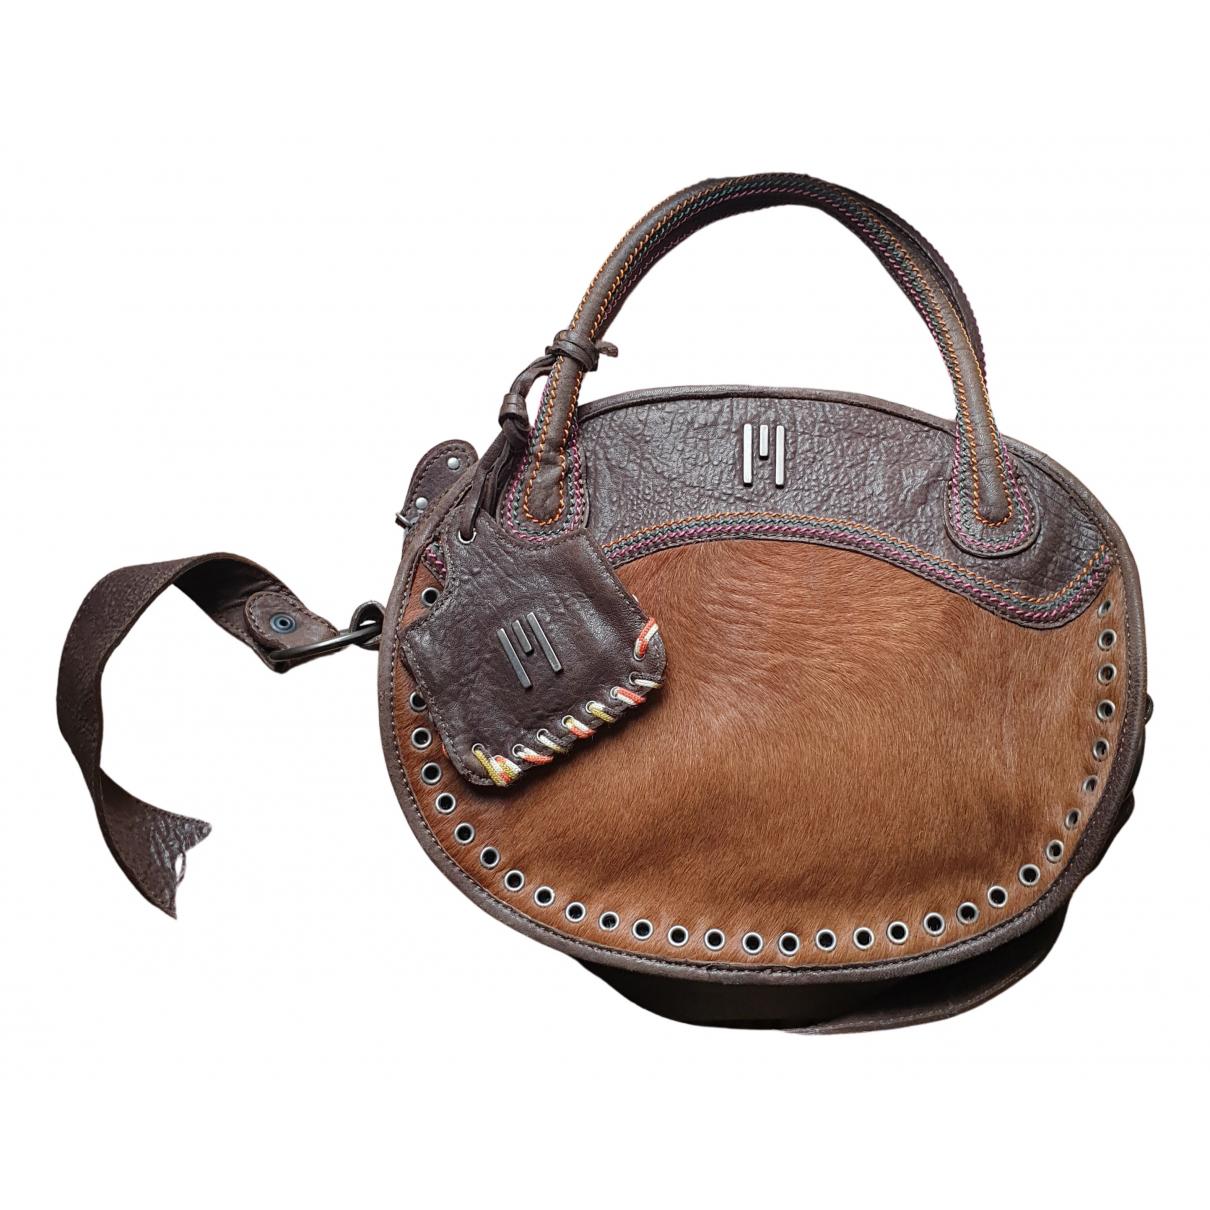 M Missoni N Brown Pony-style calfskin handbag for Women N